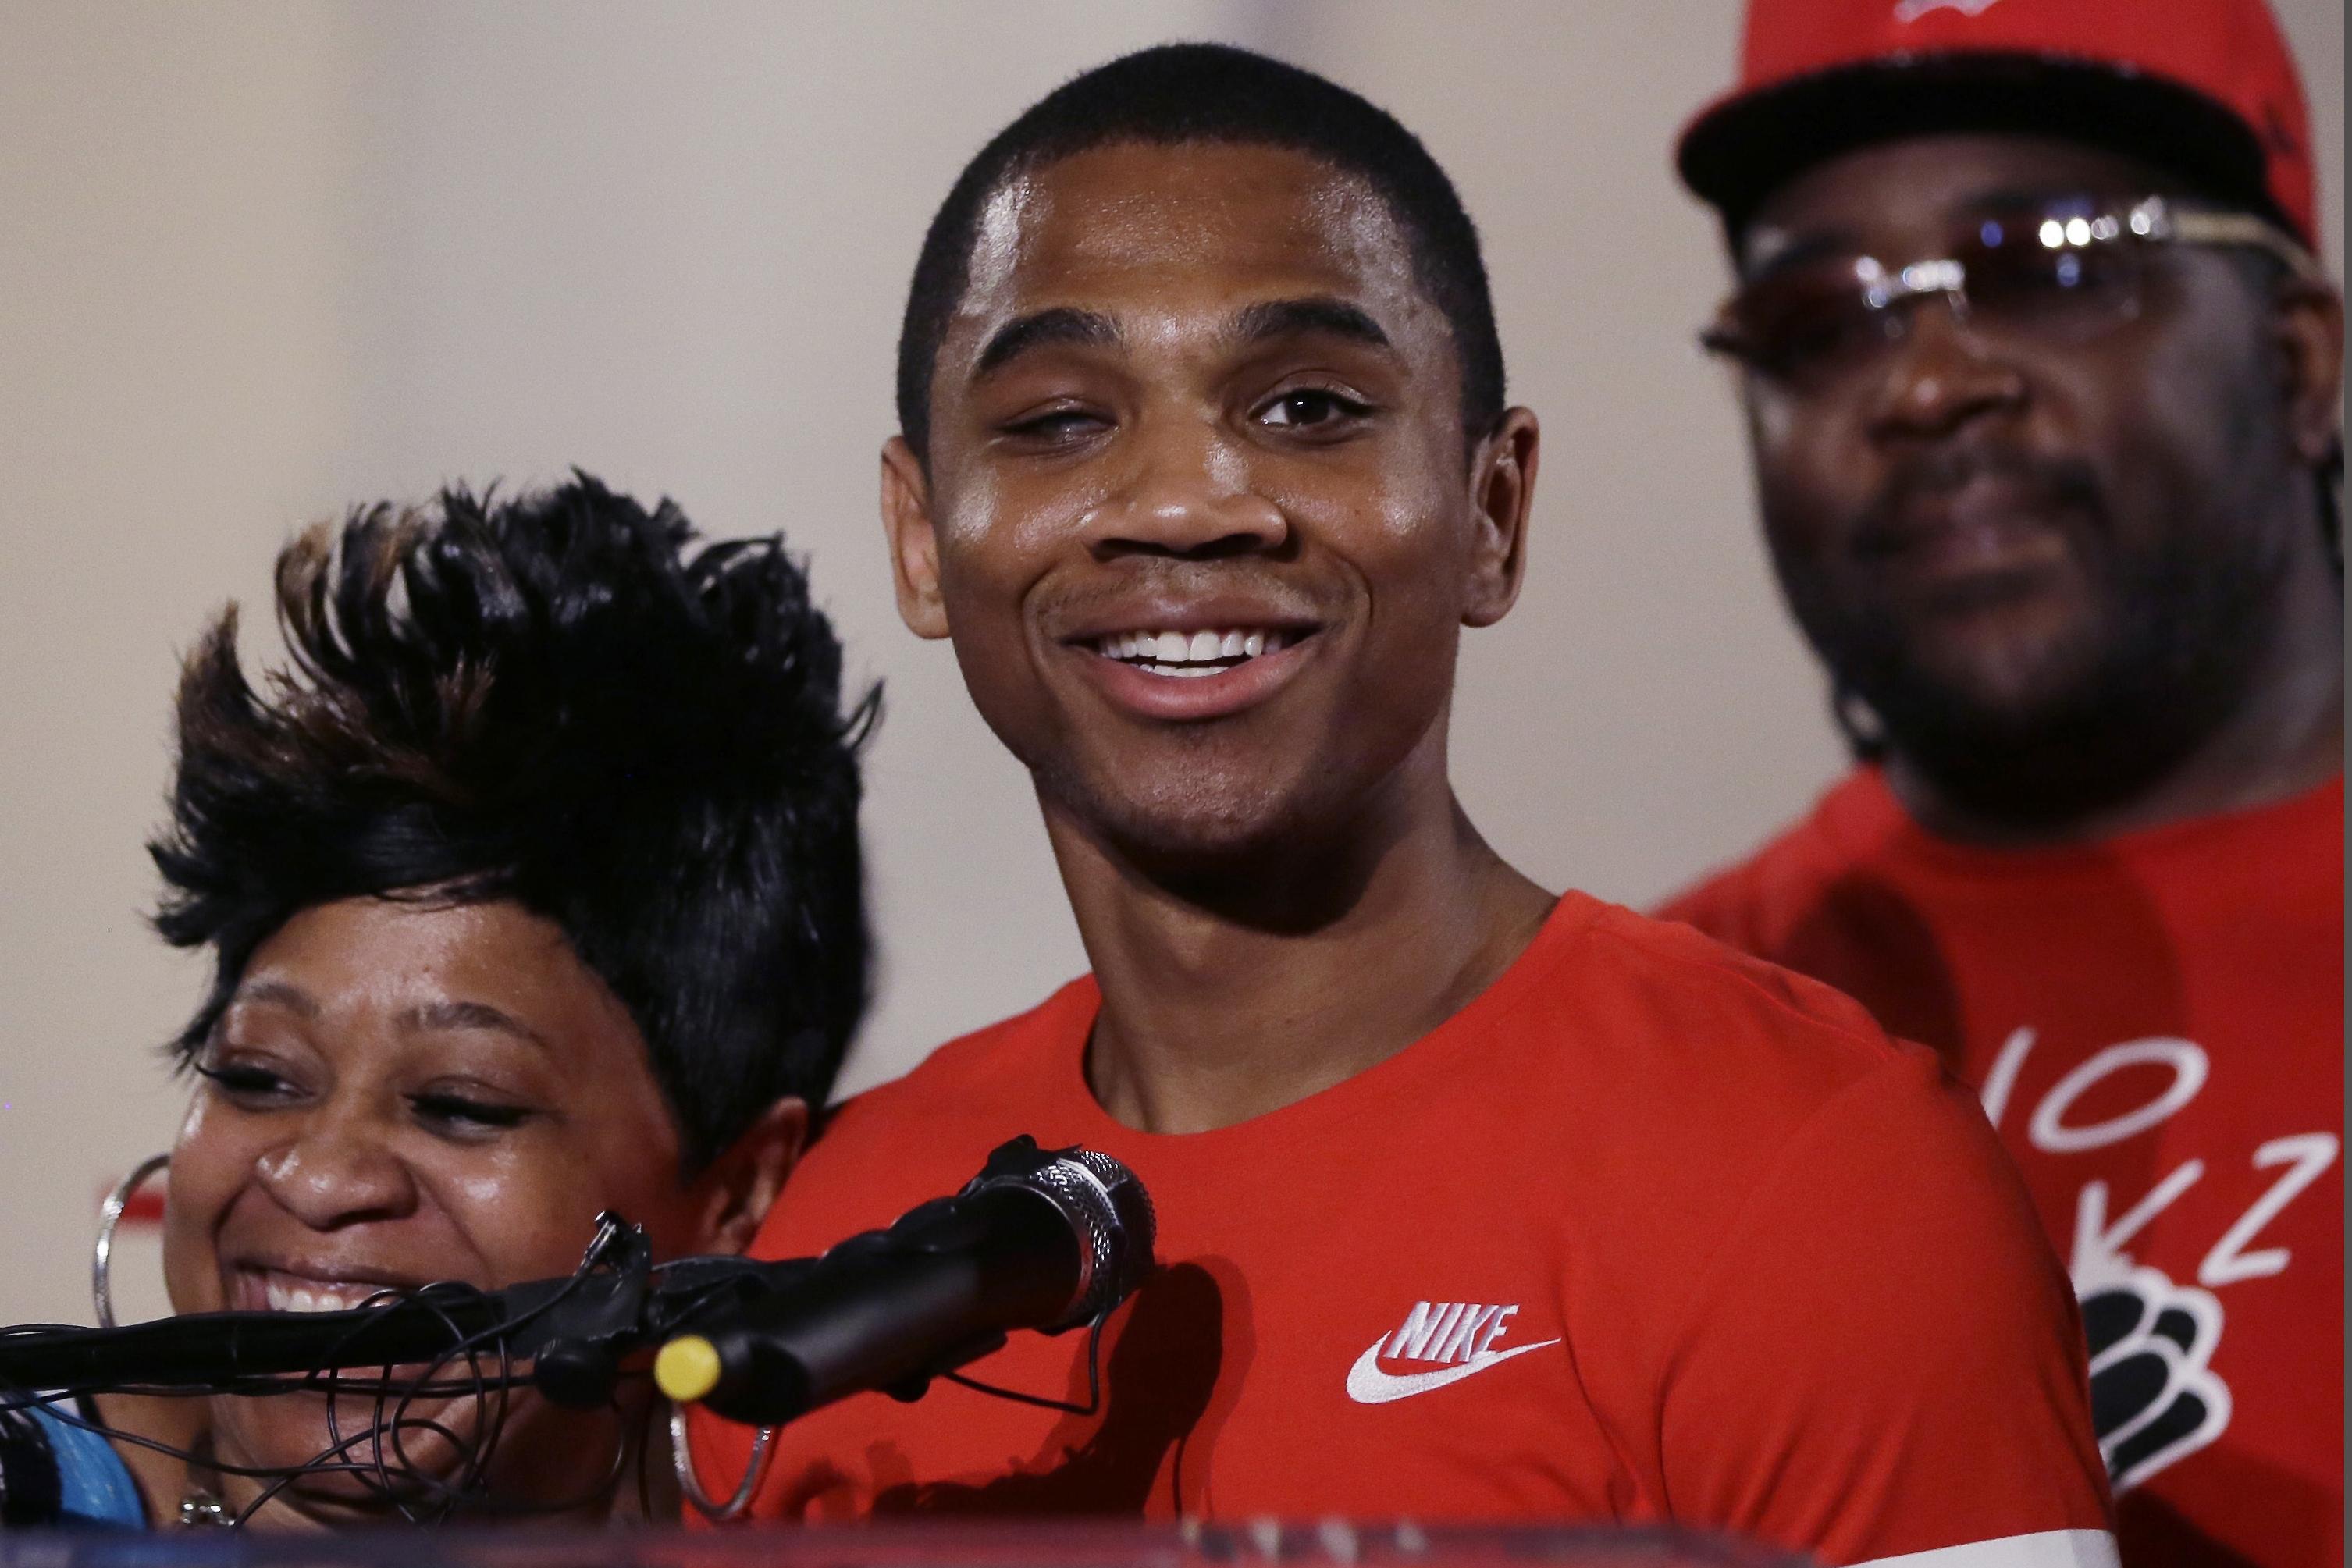 Shoe test adds strange twist to Detroit wrongful conviction